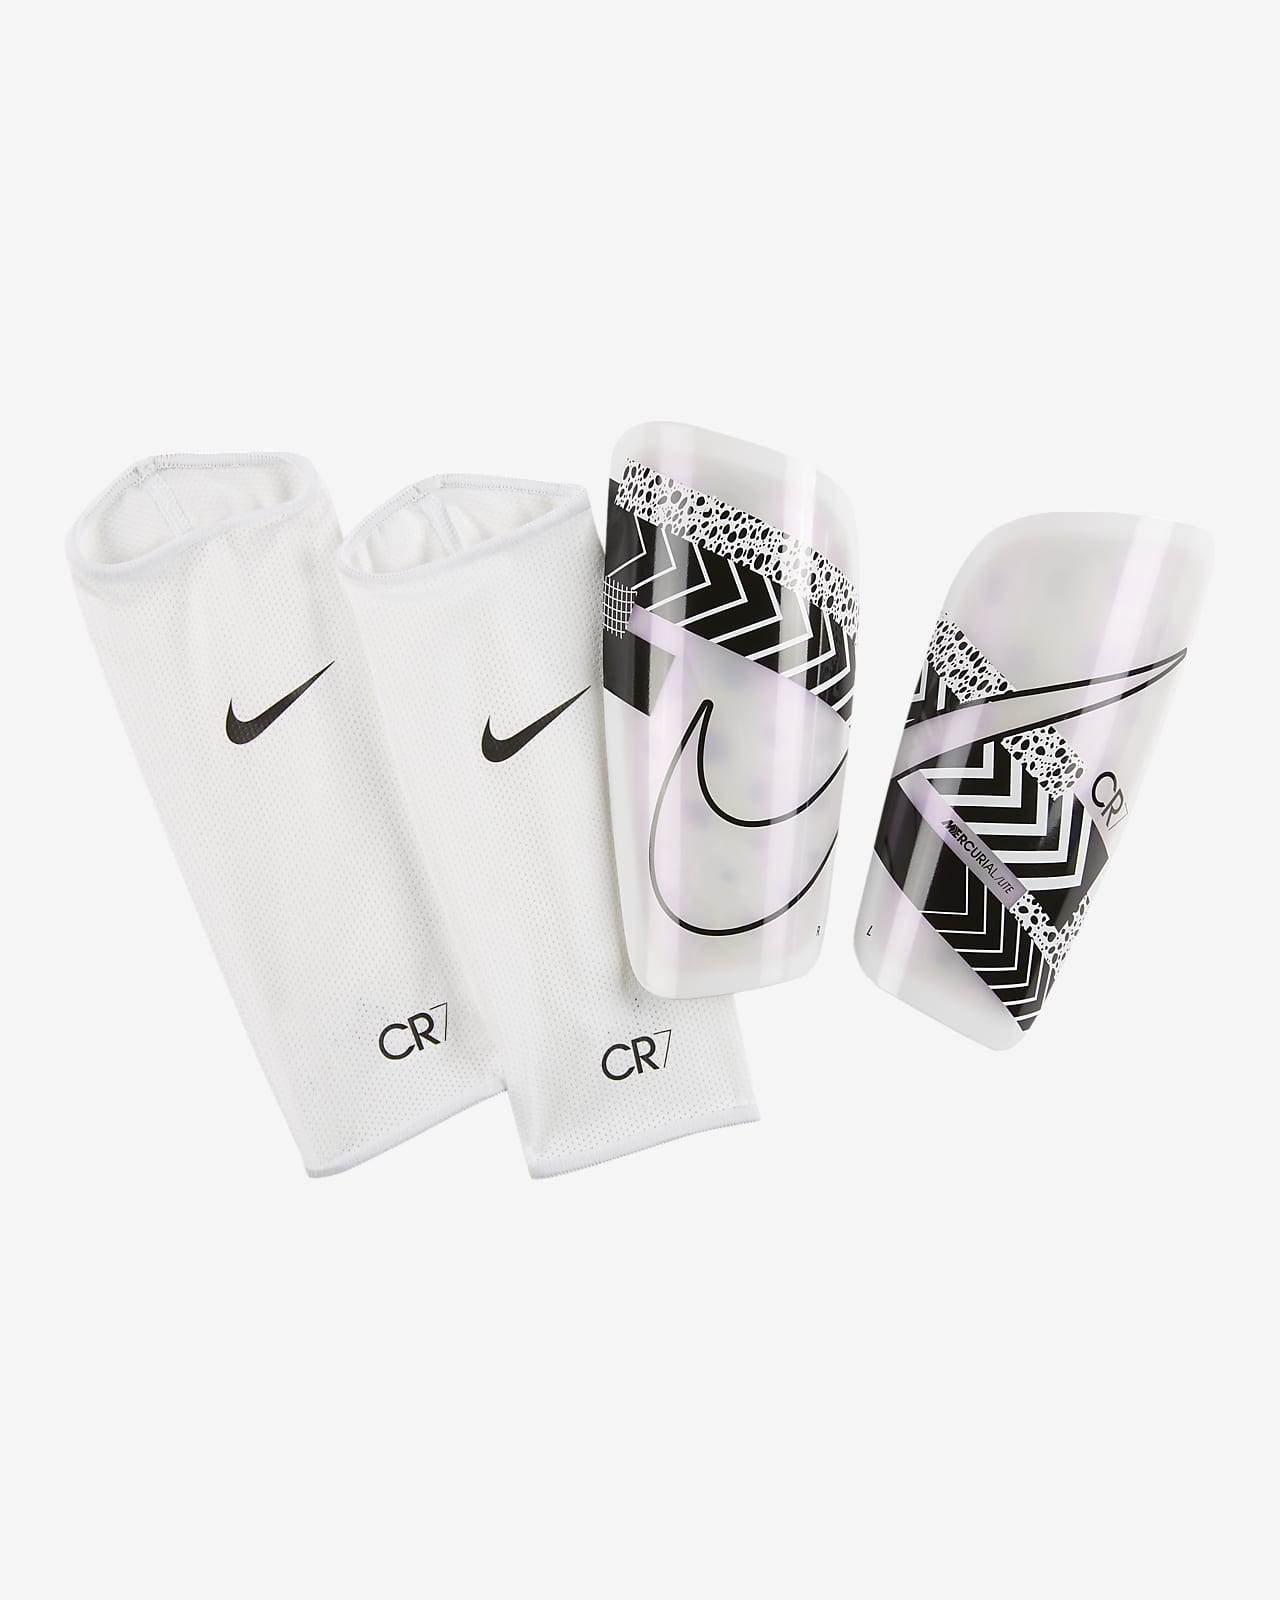 Protège-tibias de football Nike Mercurial Lite CR7